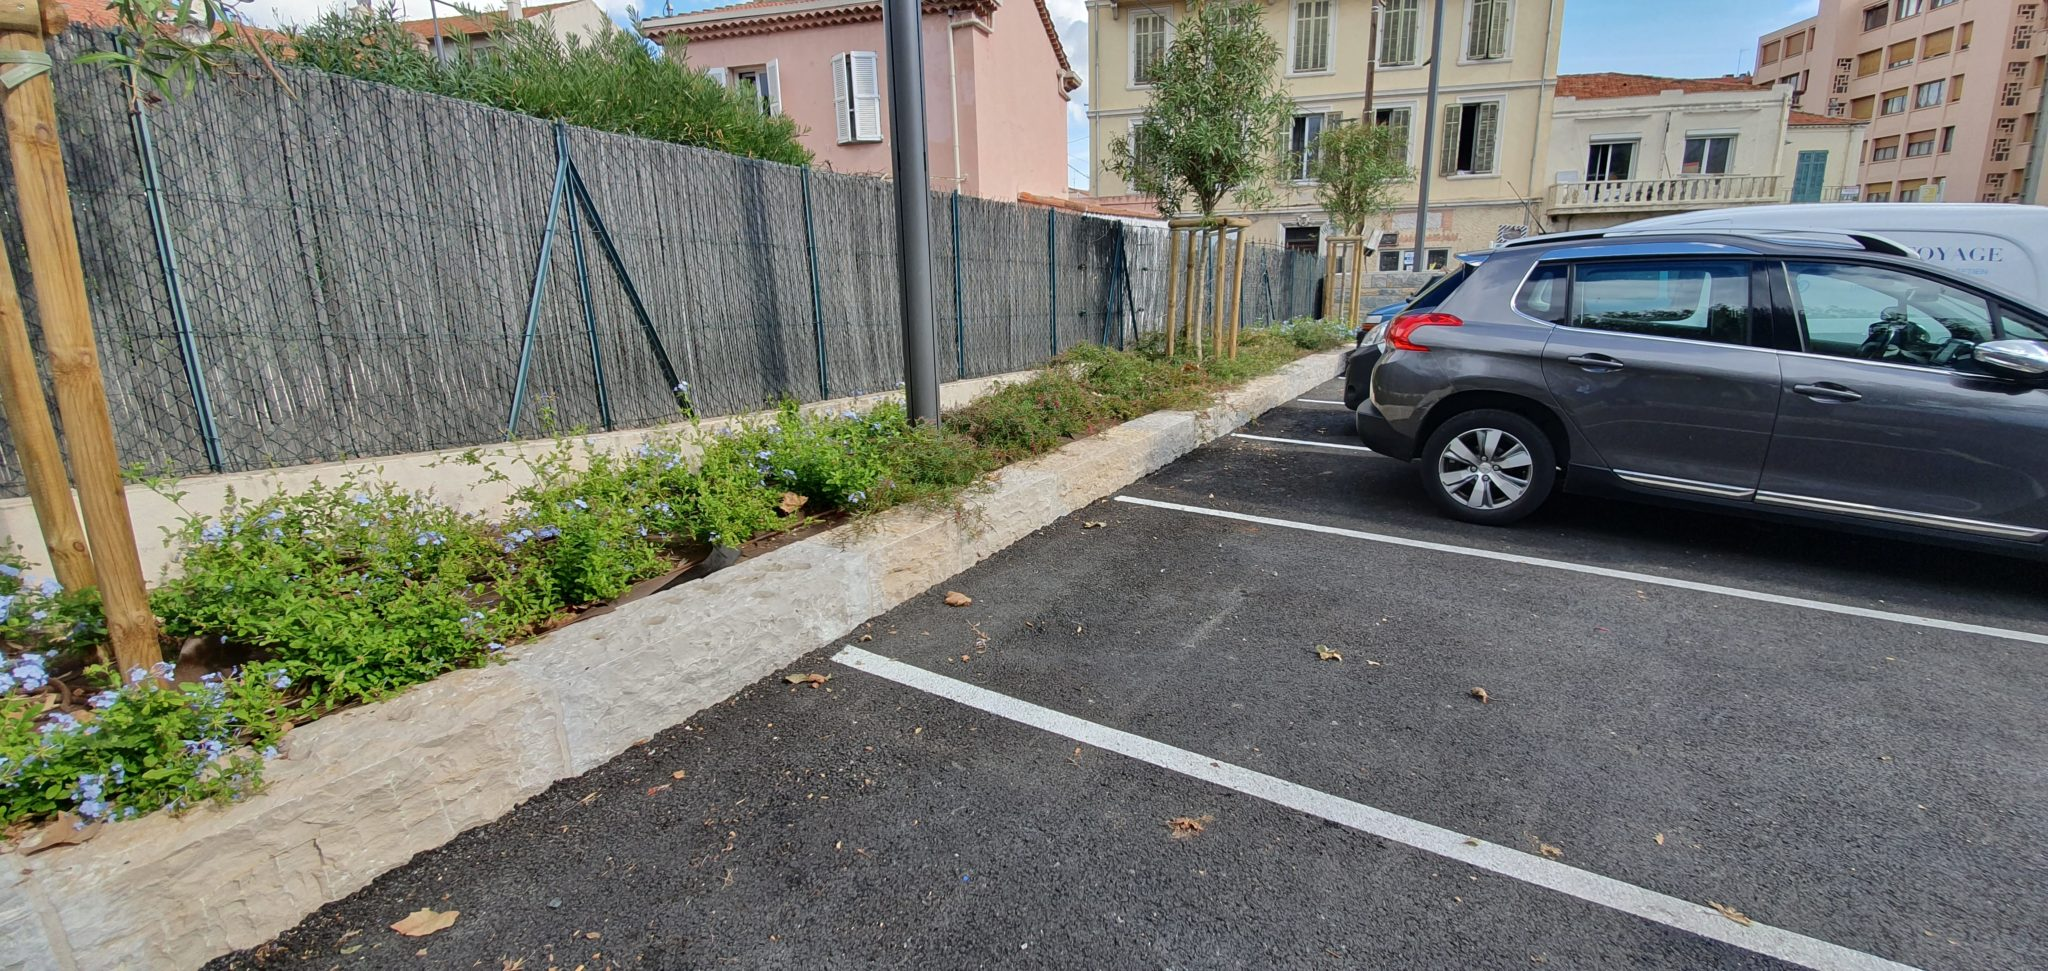 Chantier parking platanes cannes